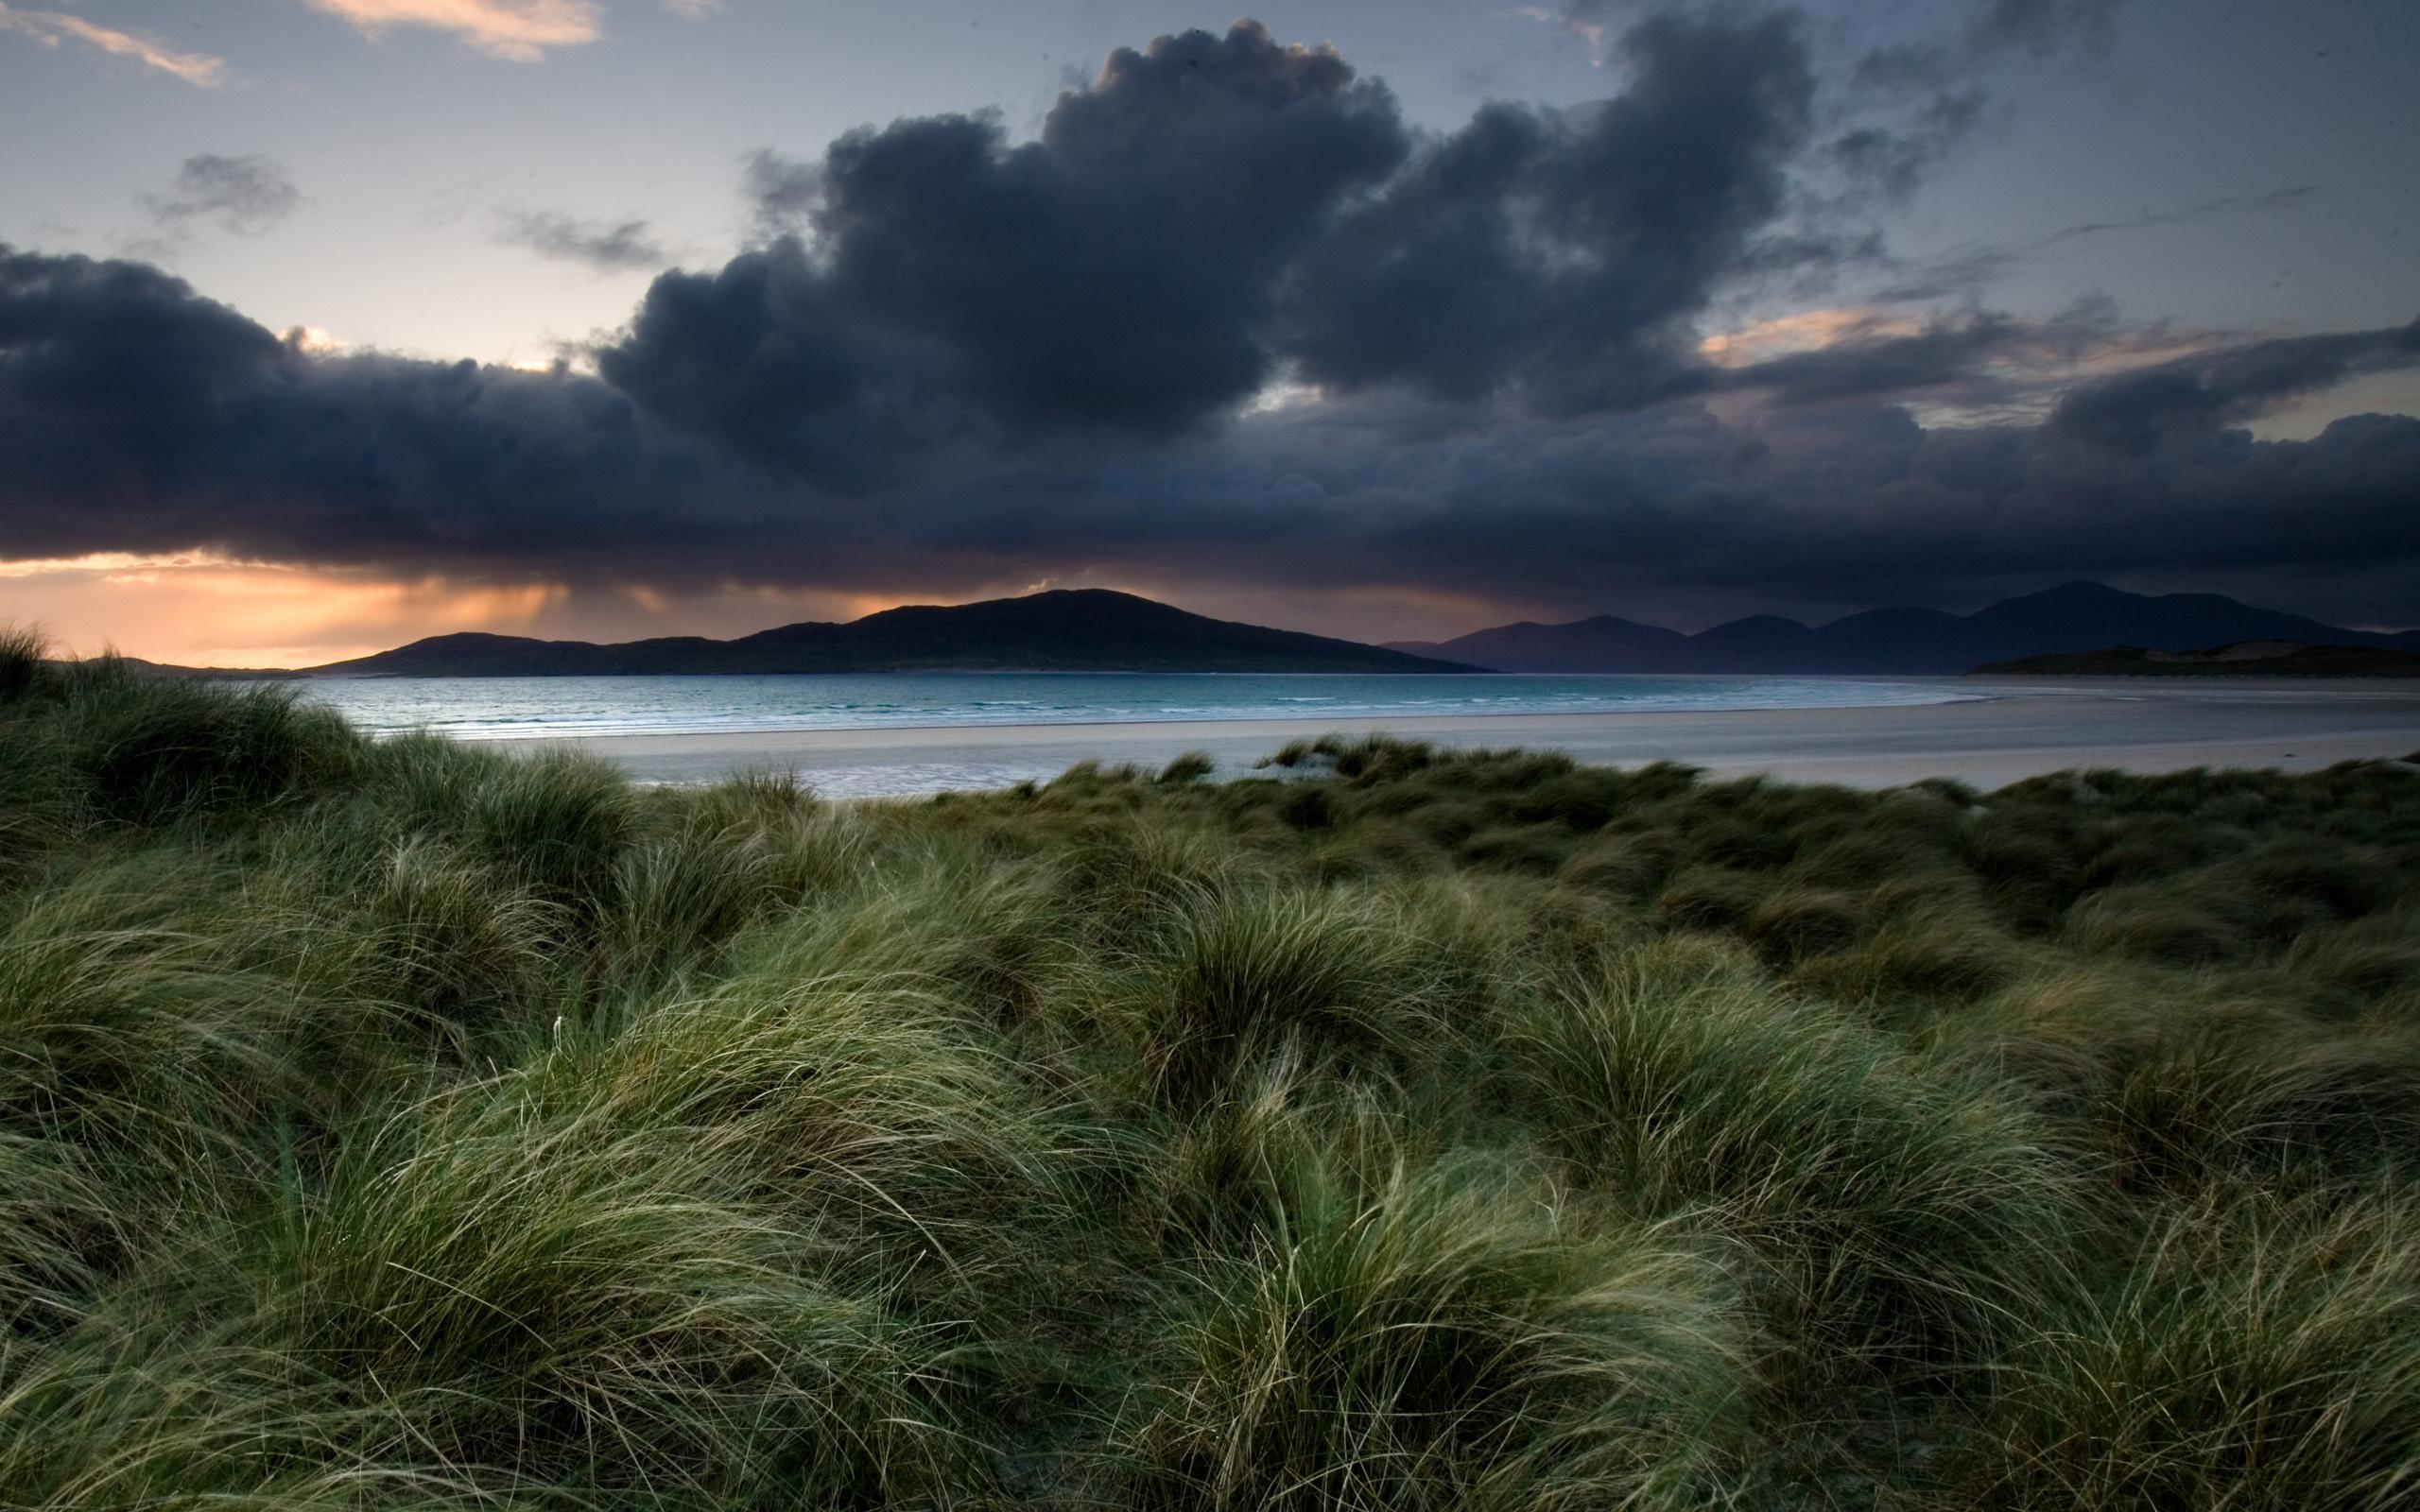 природа небо облака озеро трава горы бесплатно